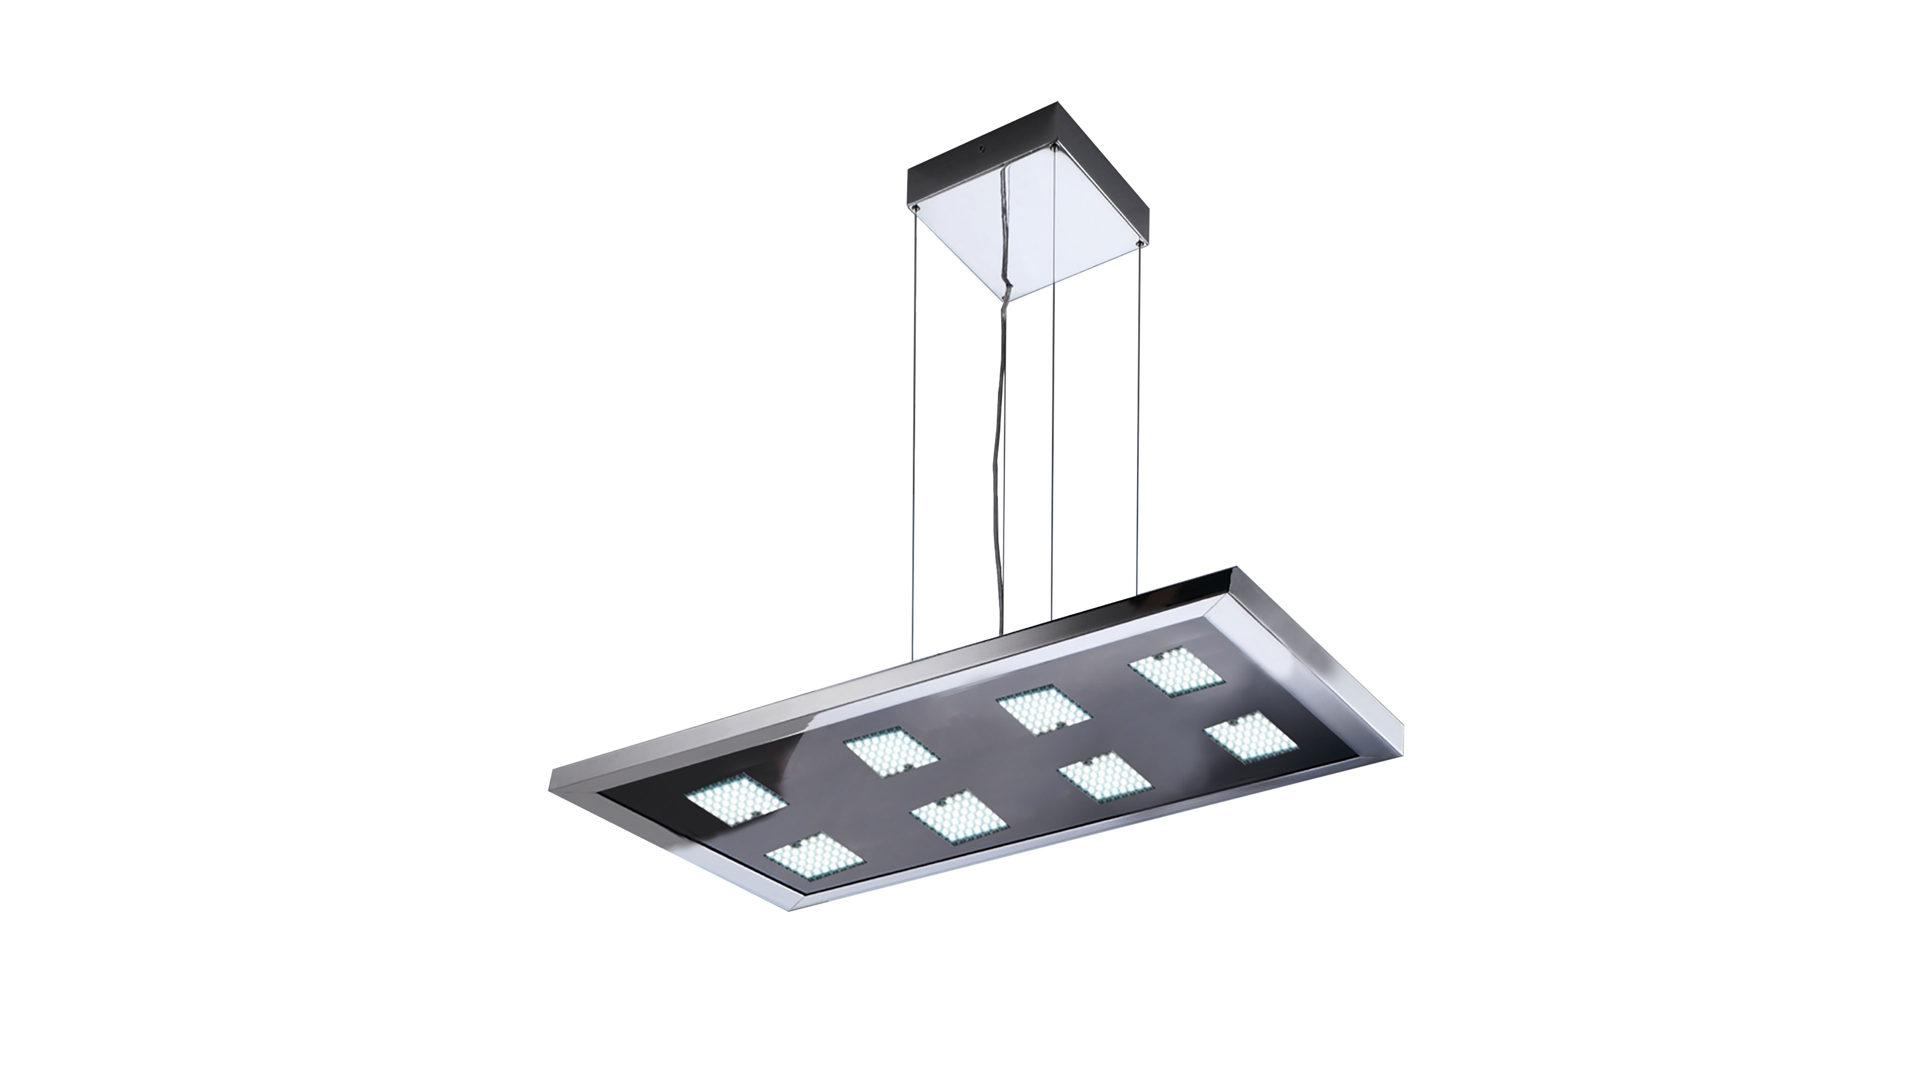 EVOTEC LED Pendelleuchte, Aluminium U0026 Nickel Gebürstet, Schwarzes Glas    Ca., Bad Homburg Bei Frankfurt